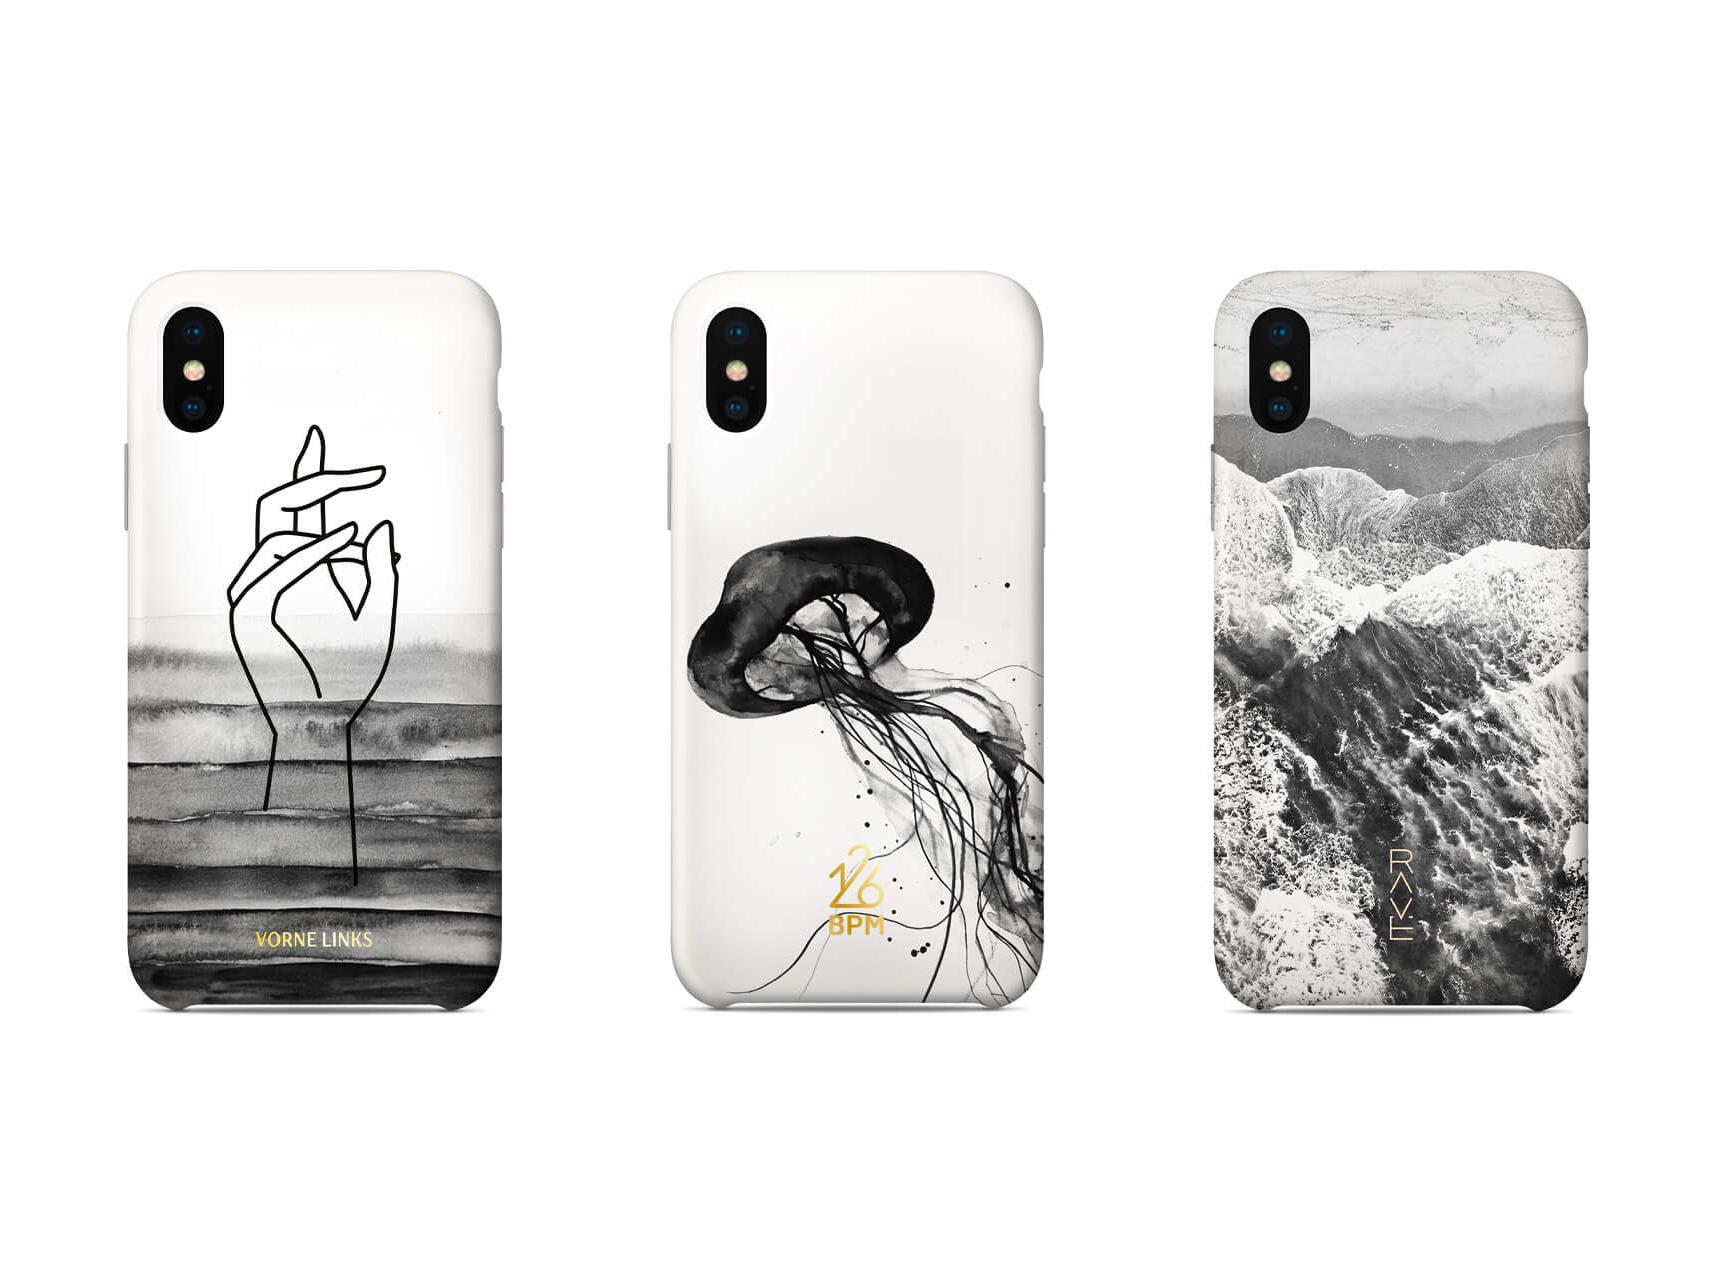 Alexandra linortner packaging phone cases design